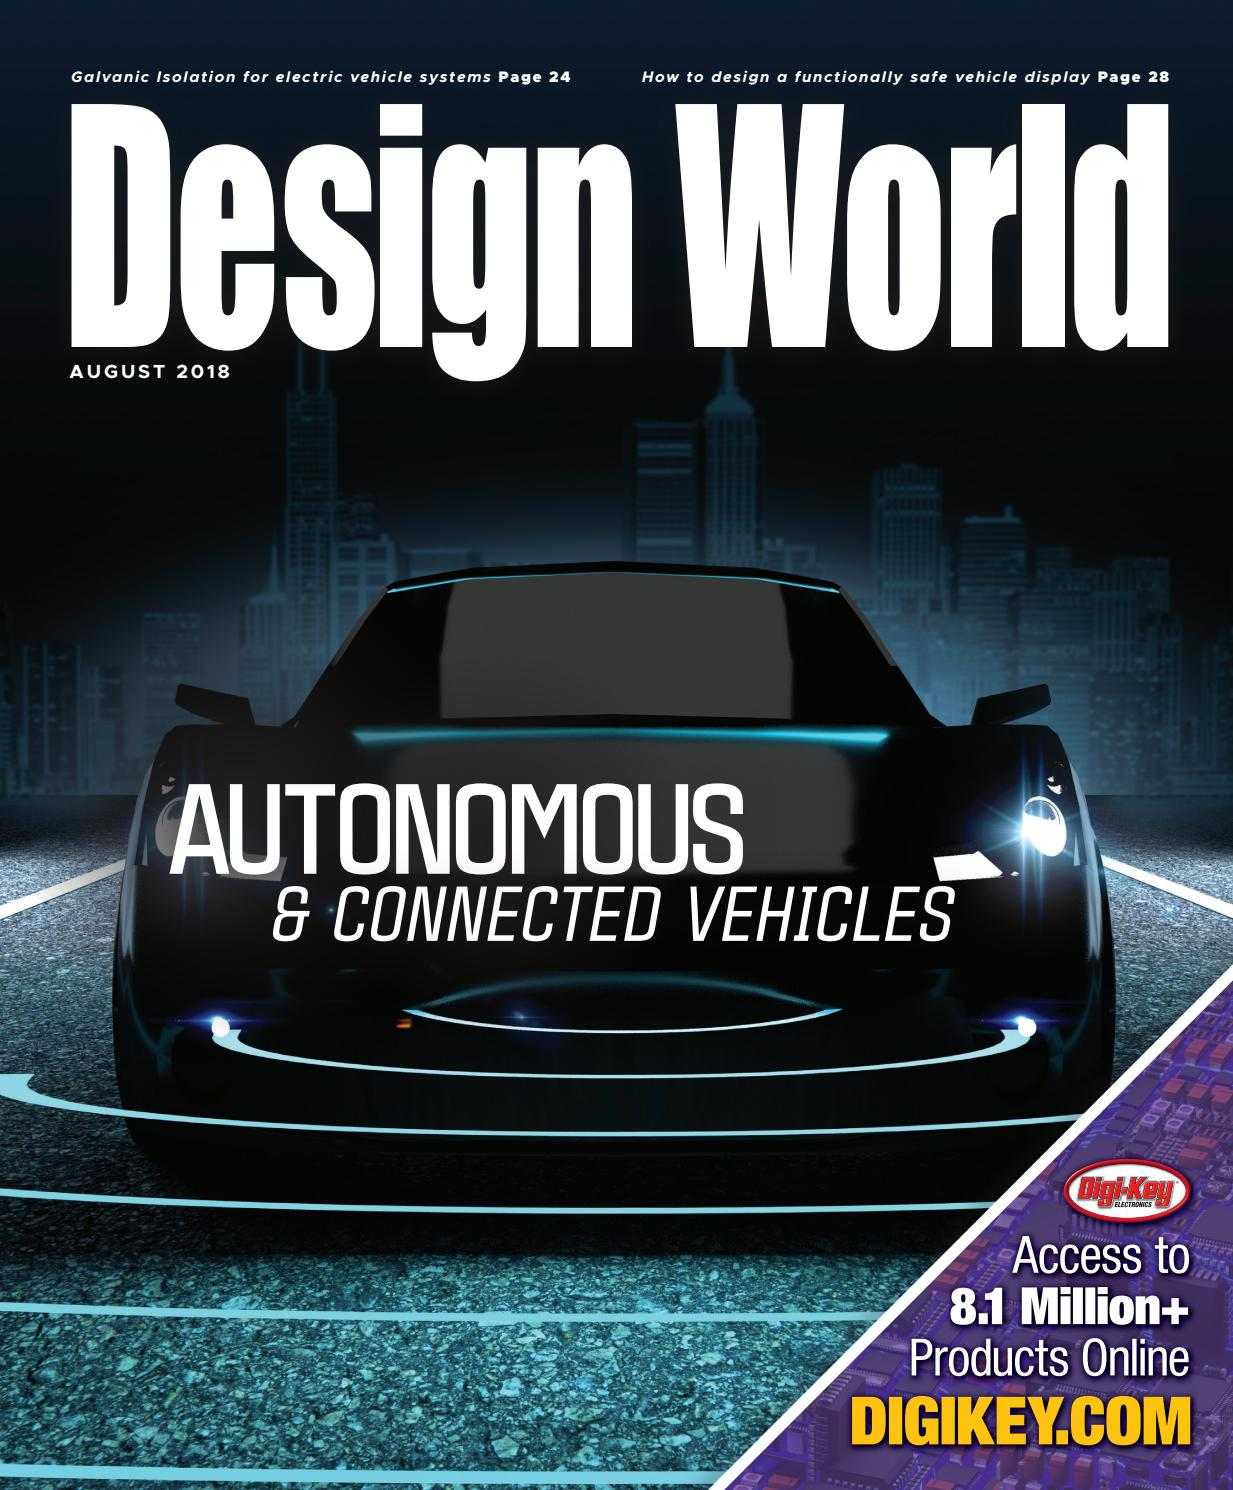 Autonomous & Connected Vehicles August 2018 by WTWH Media